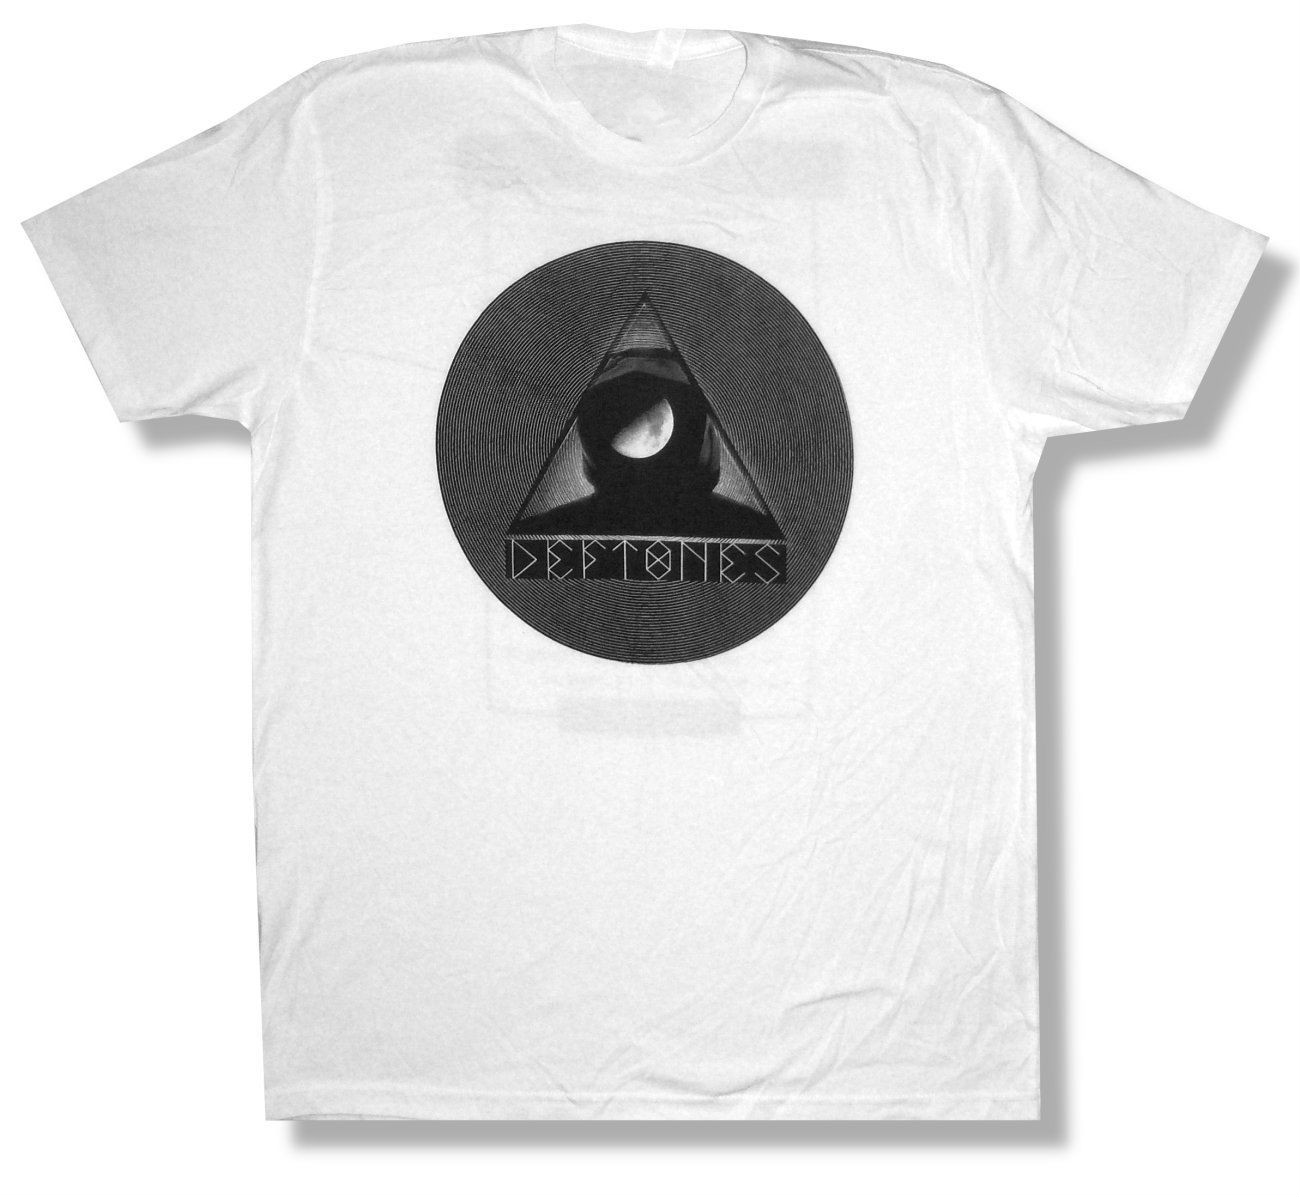 T shirt deftones white pony - Deftones Half Moon Photo Us Tour 2011 Soft White T Shirt